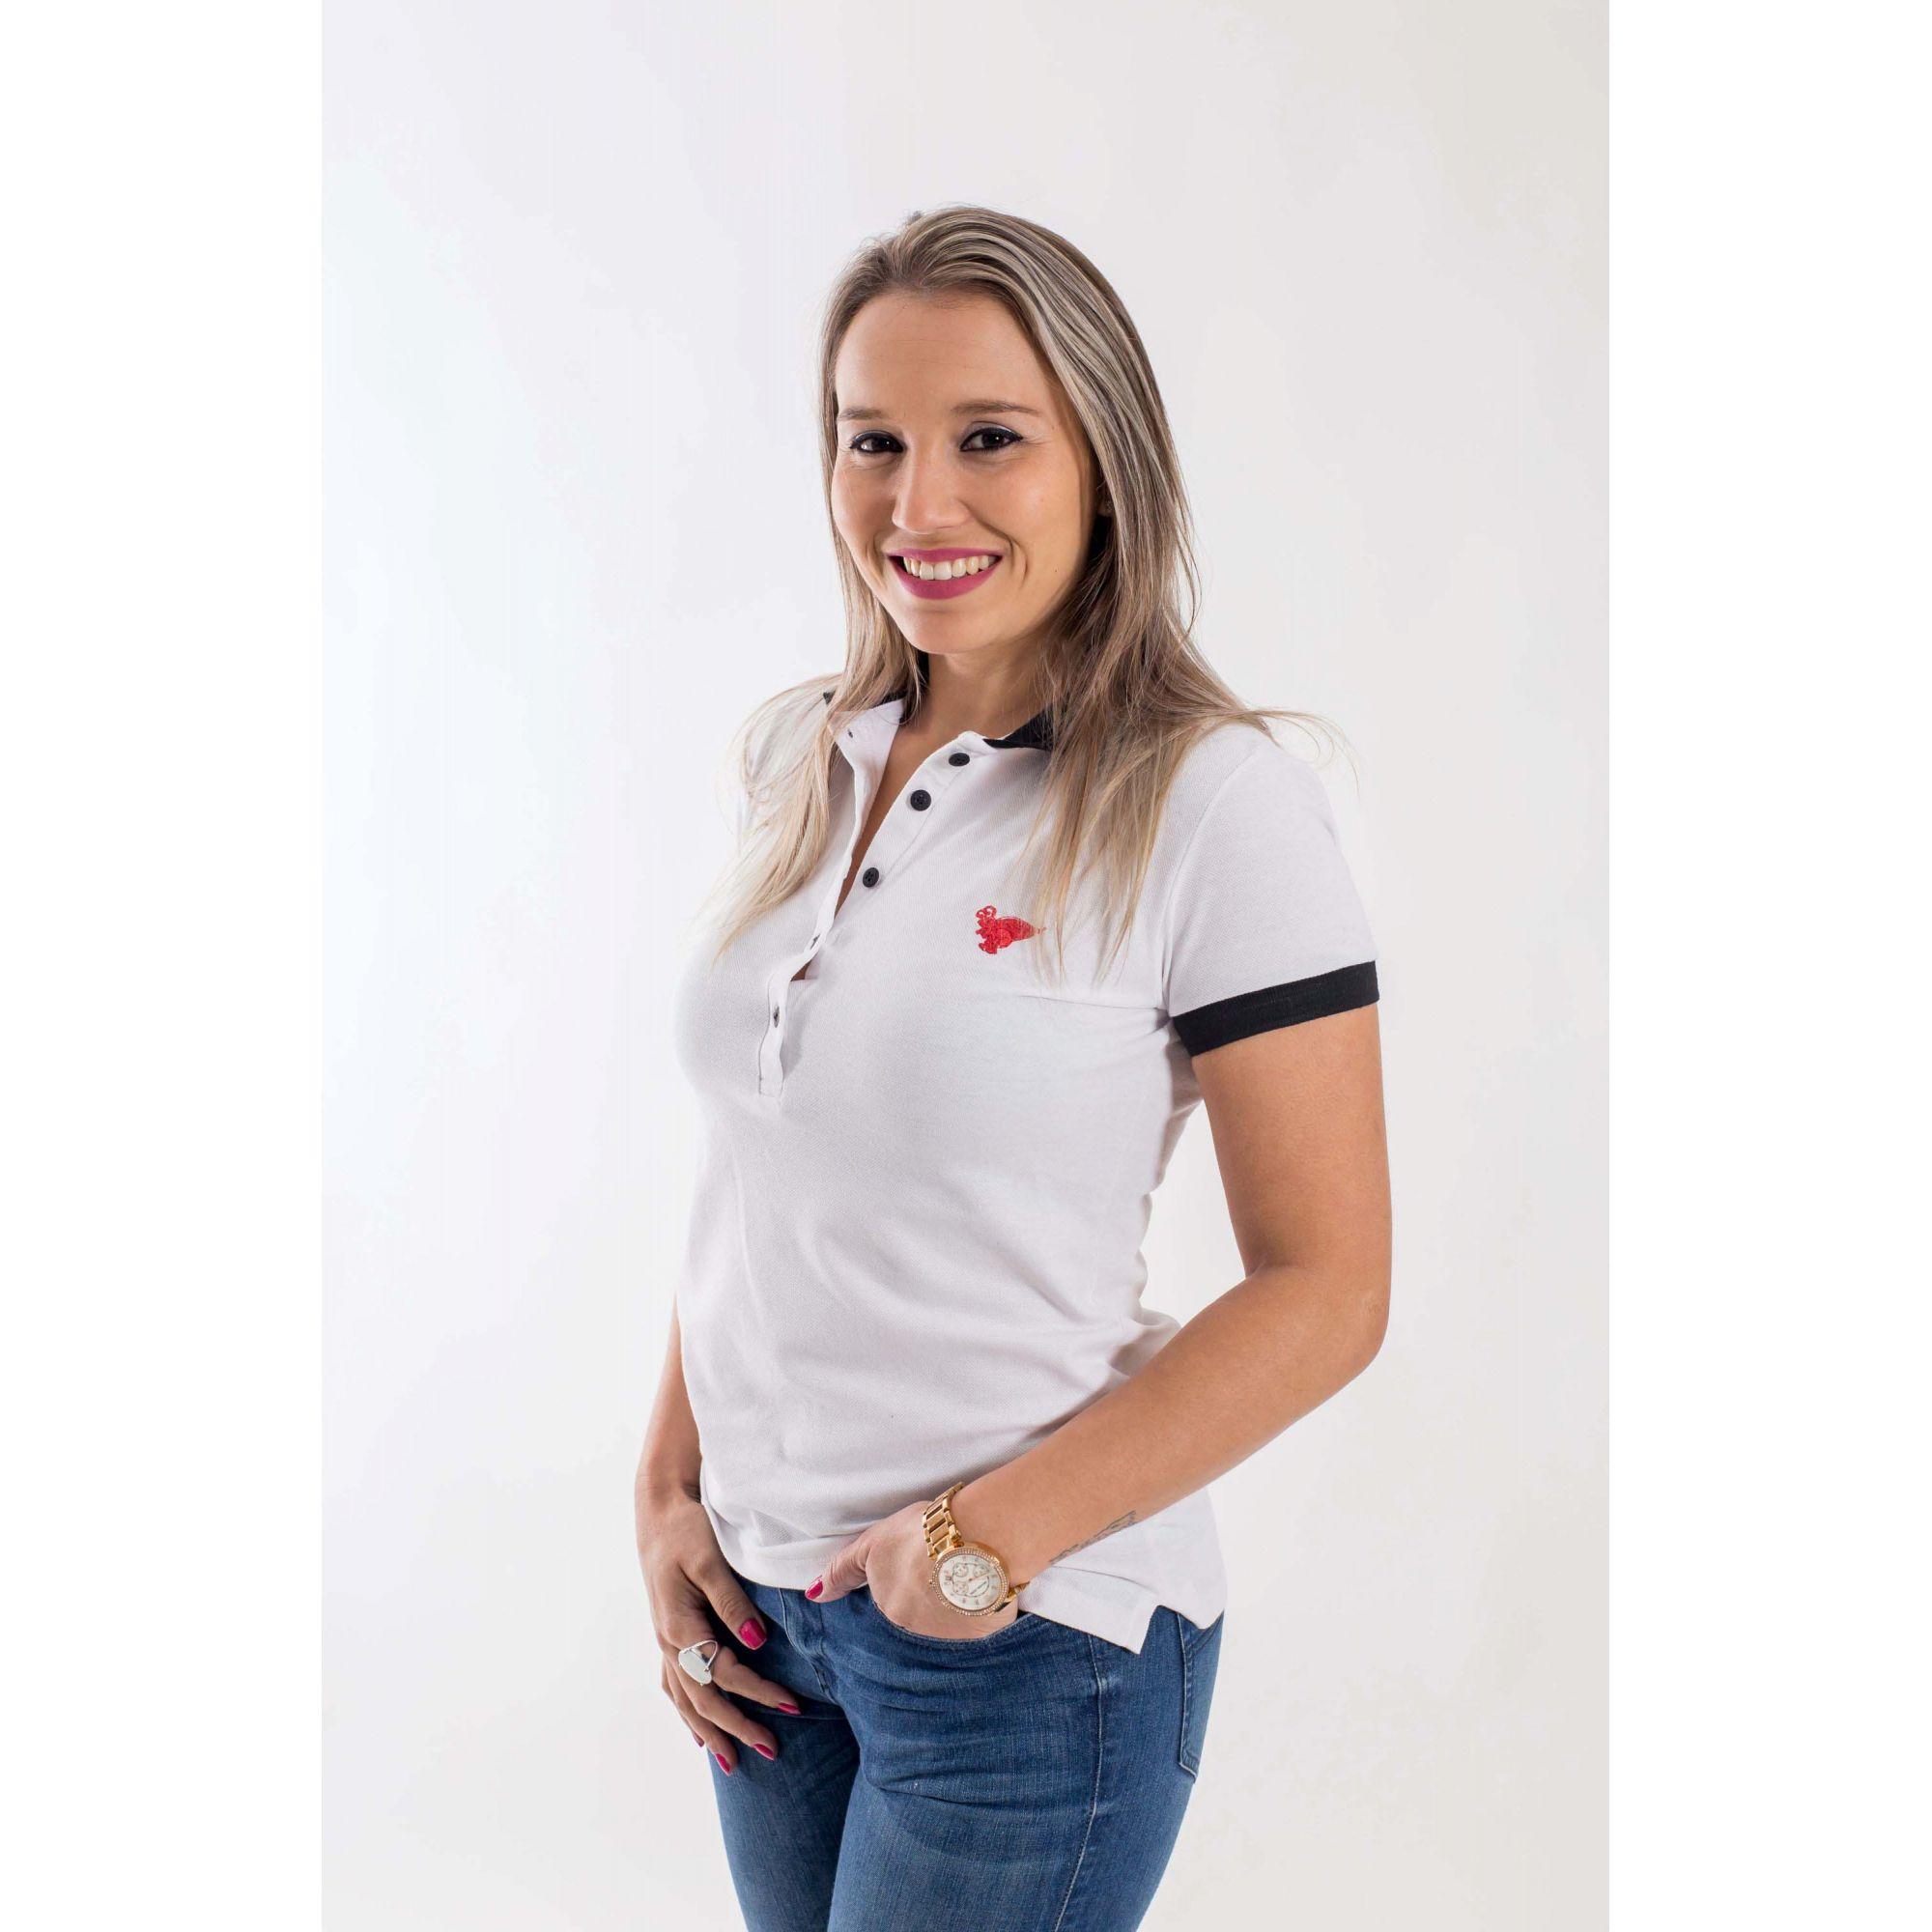 Camisa Polo Feminina Branca com Preto  - Heitor Fashion Brazil